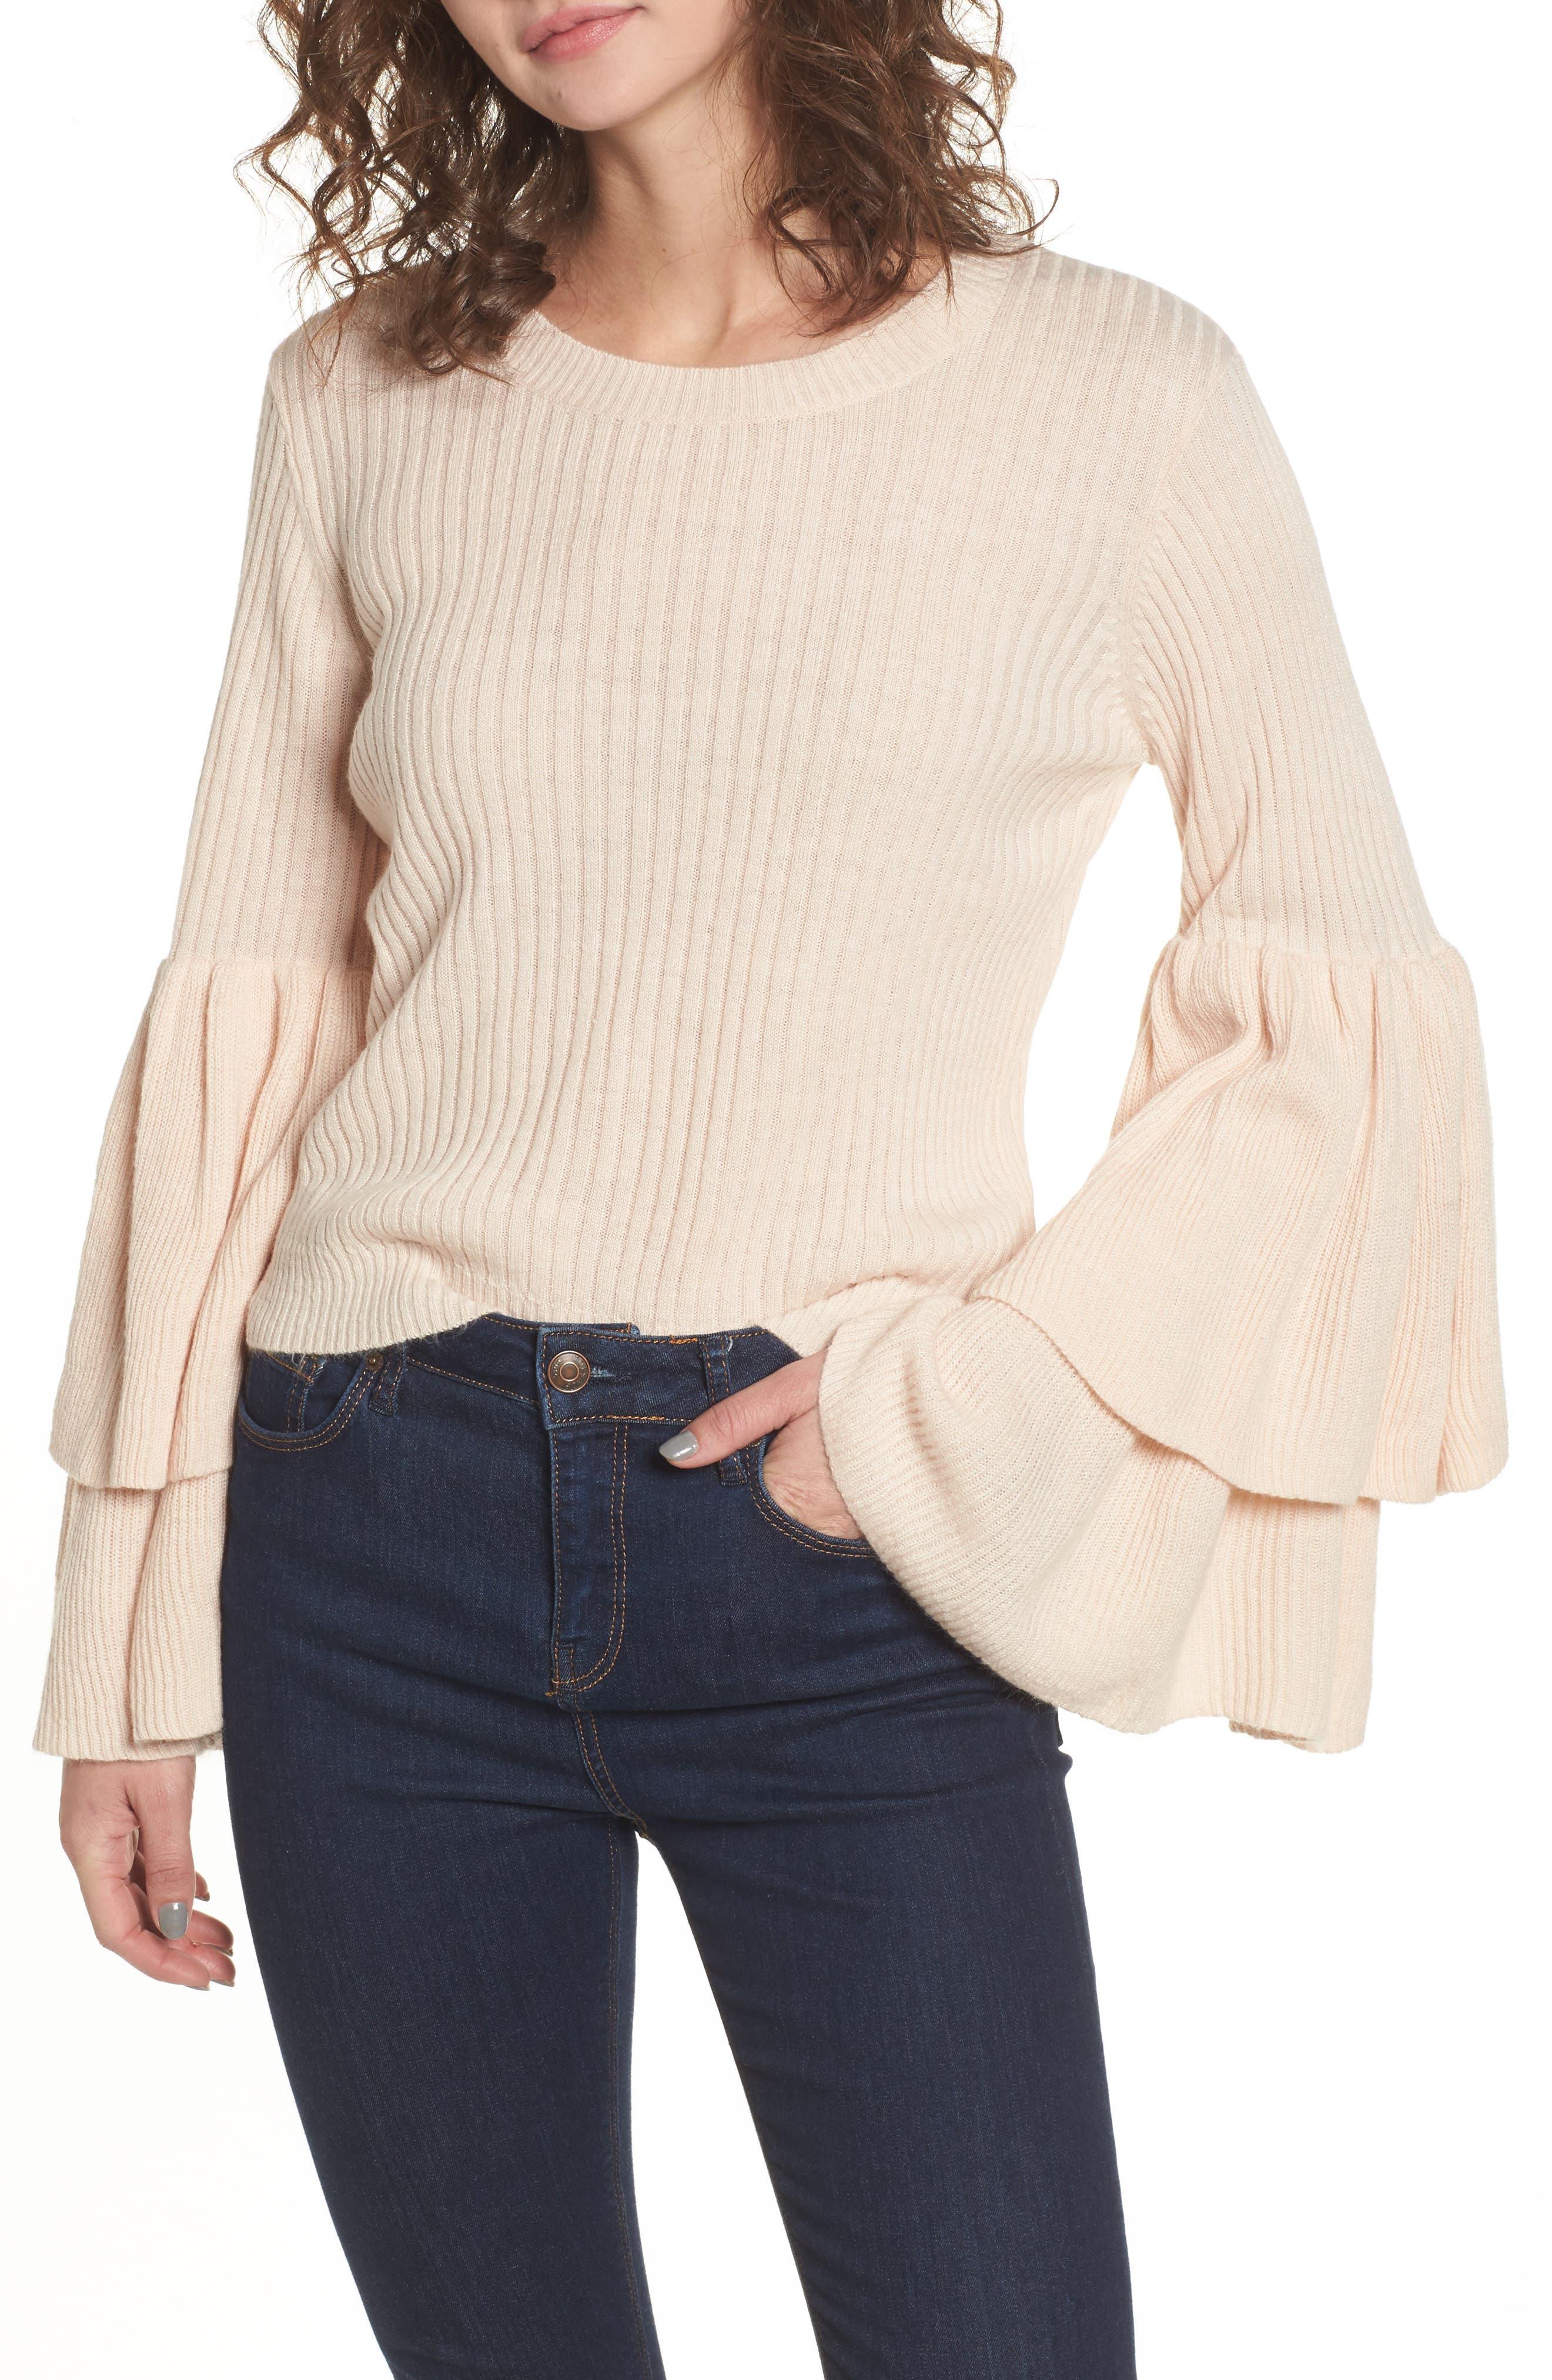 Tiara Bell Sleeve Sweater,                             Main thumbnail 1, color,                             Blush